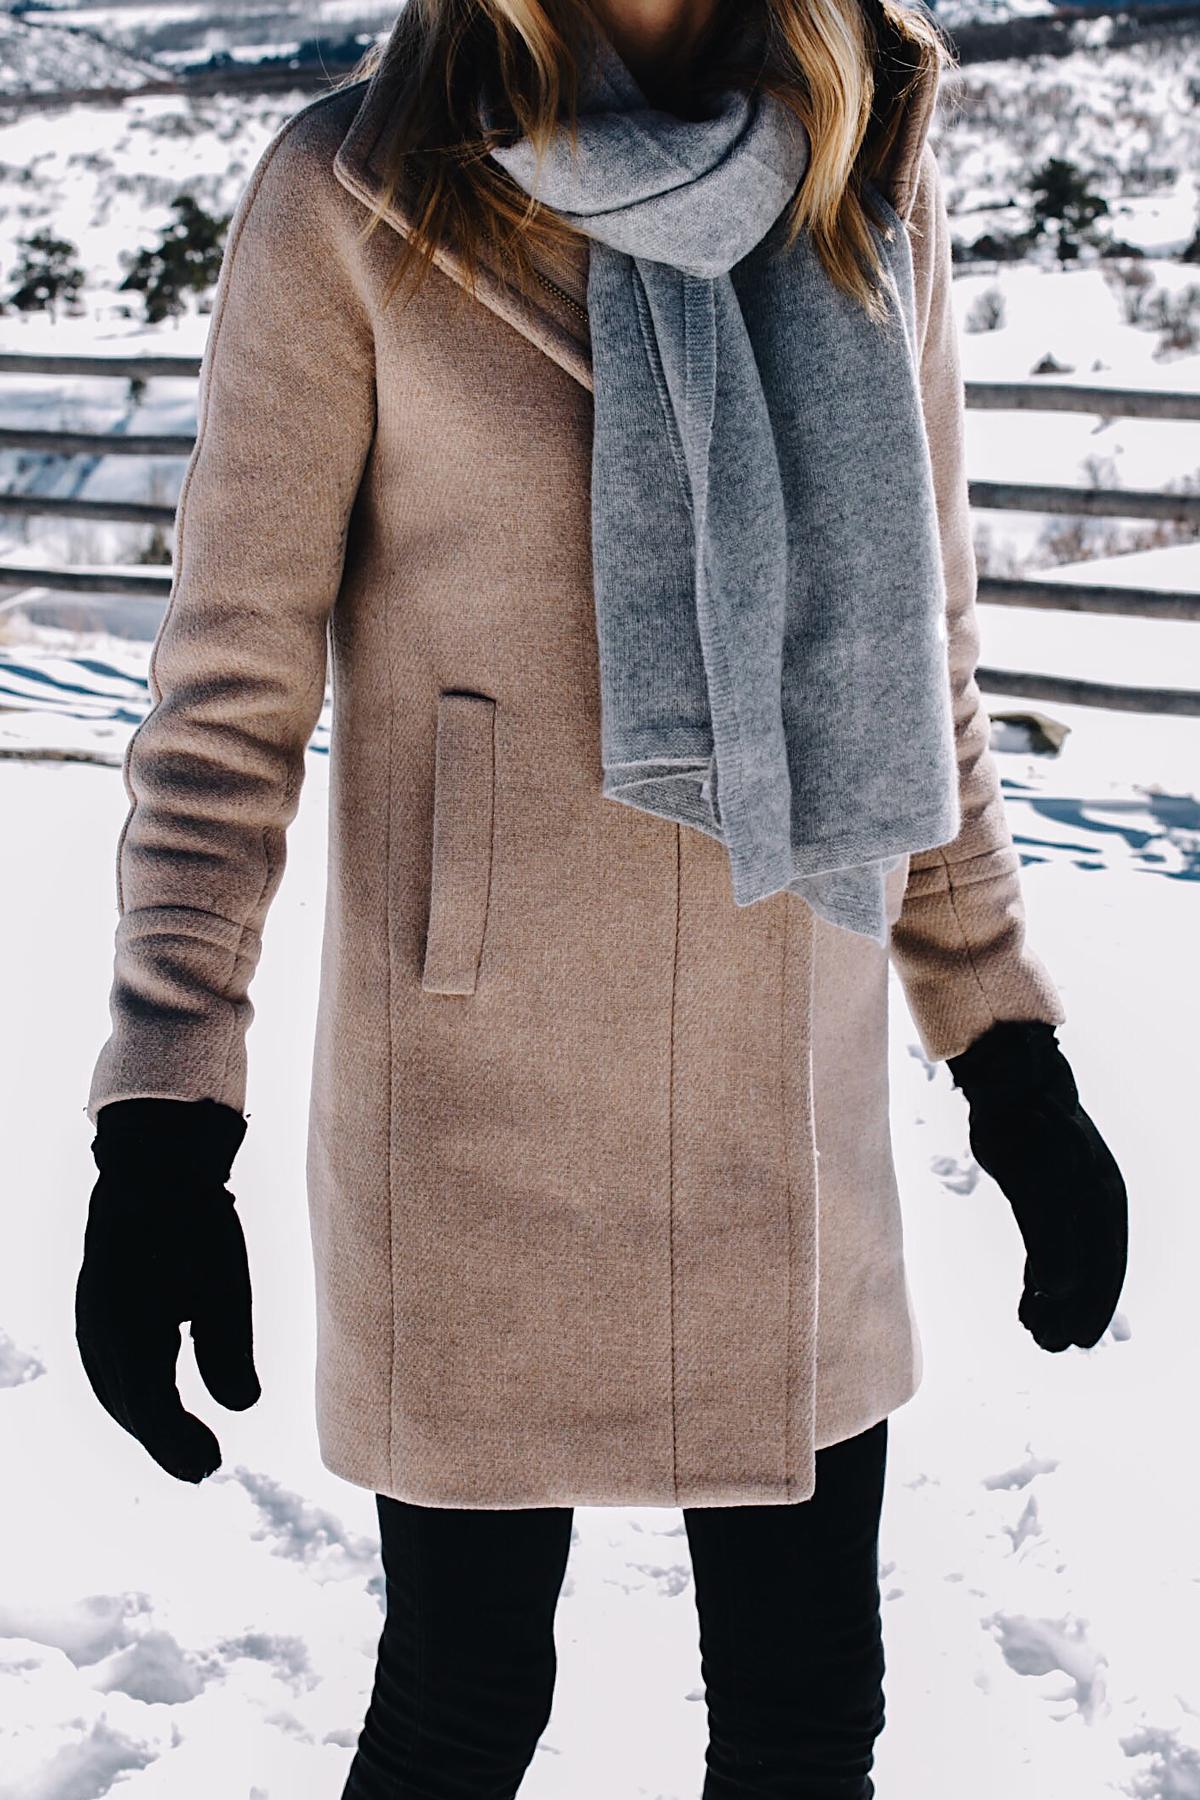 Telluride CO Snow Mountains Woman Wearing Grey Scarf Camel Coat Black Gloves Fashion Jackson Dallas Blogger Fashion Blogger